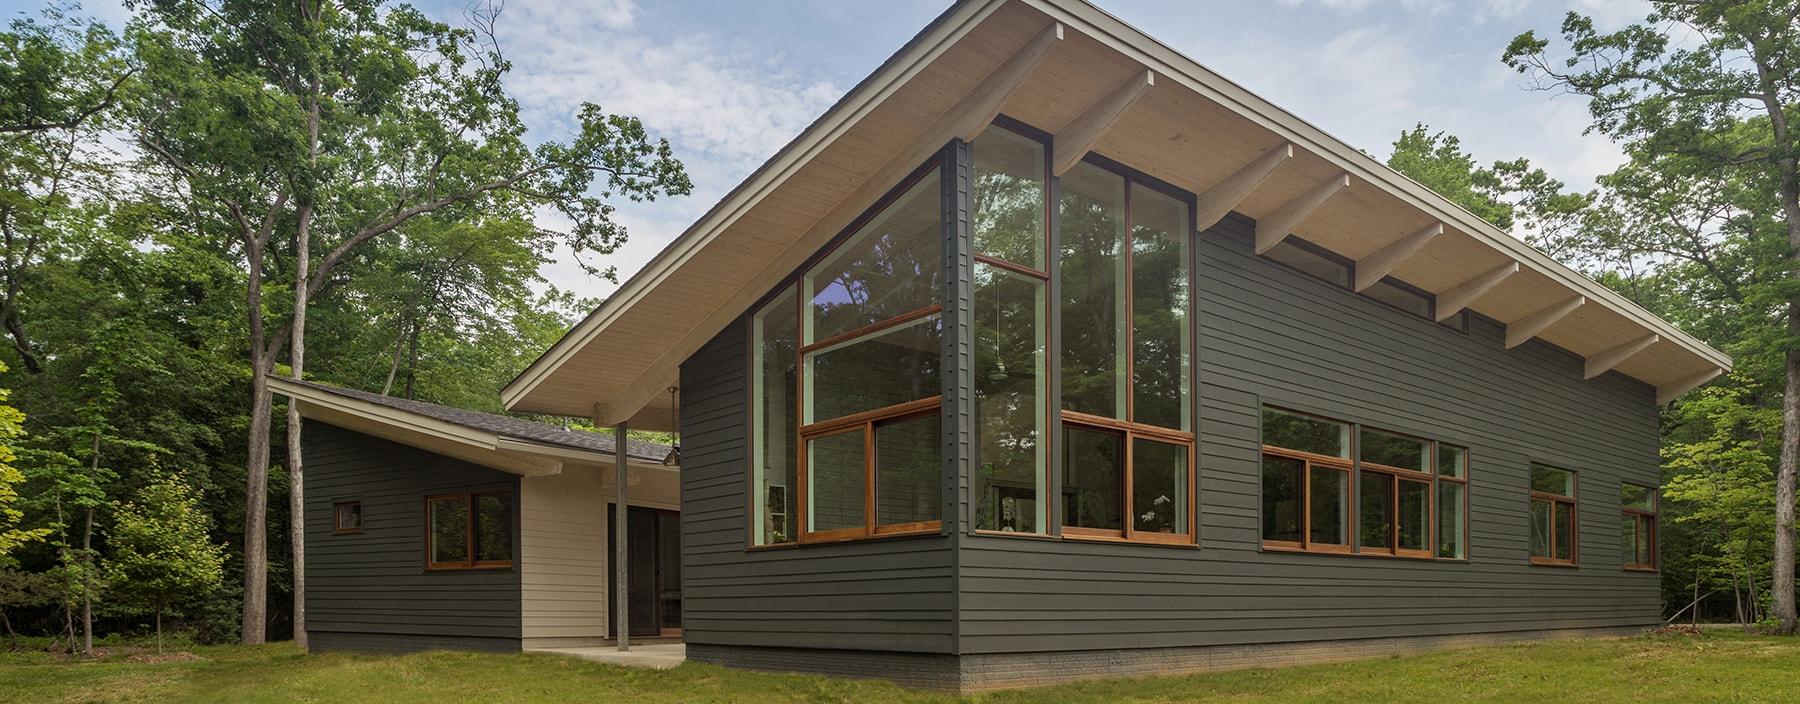 Acorn deck 39 s kit homes washington post acorn deck house for Acorn house designs